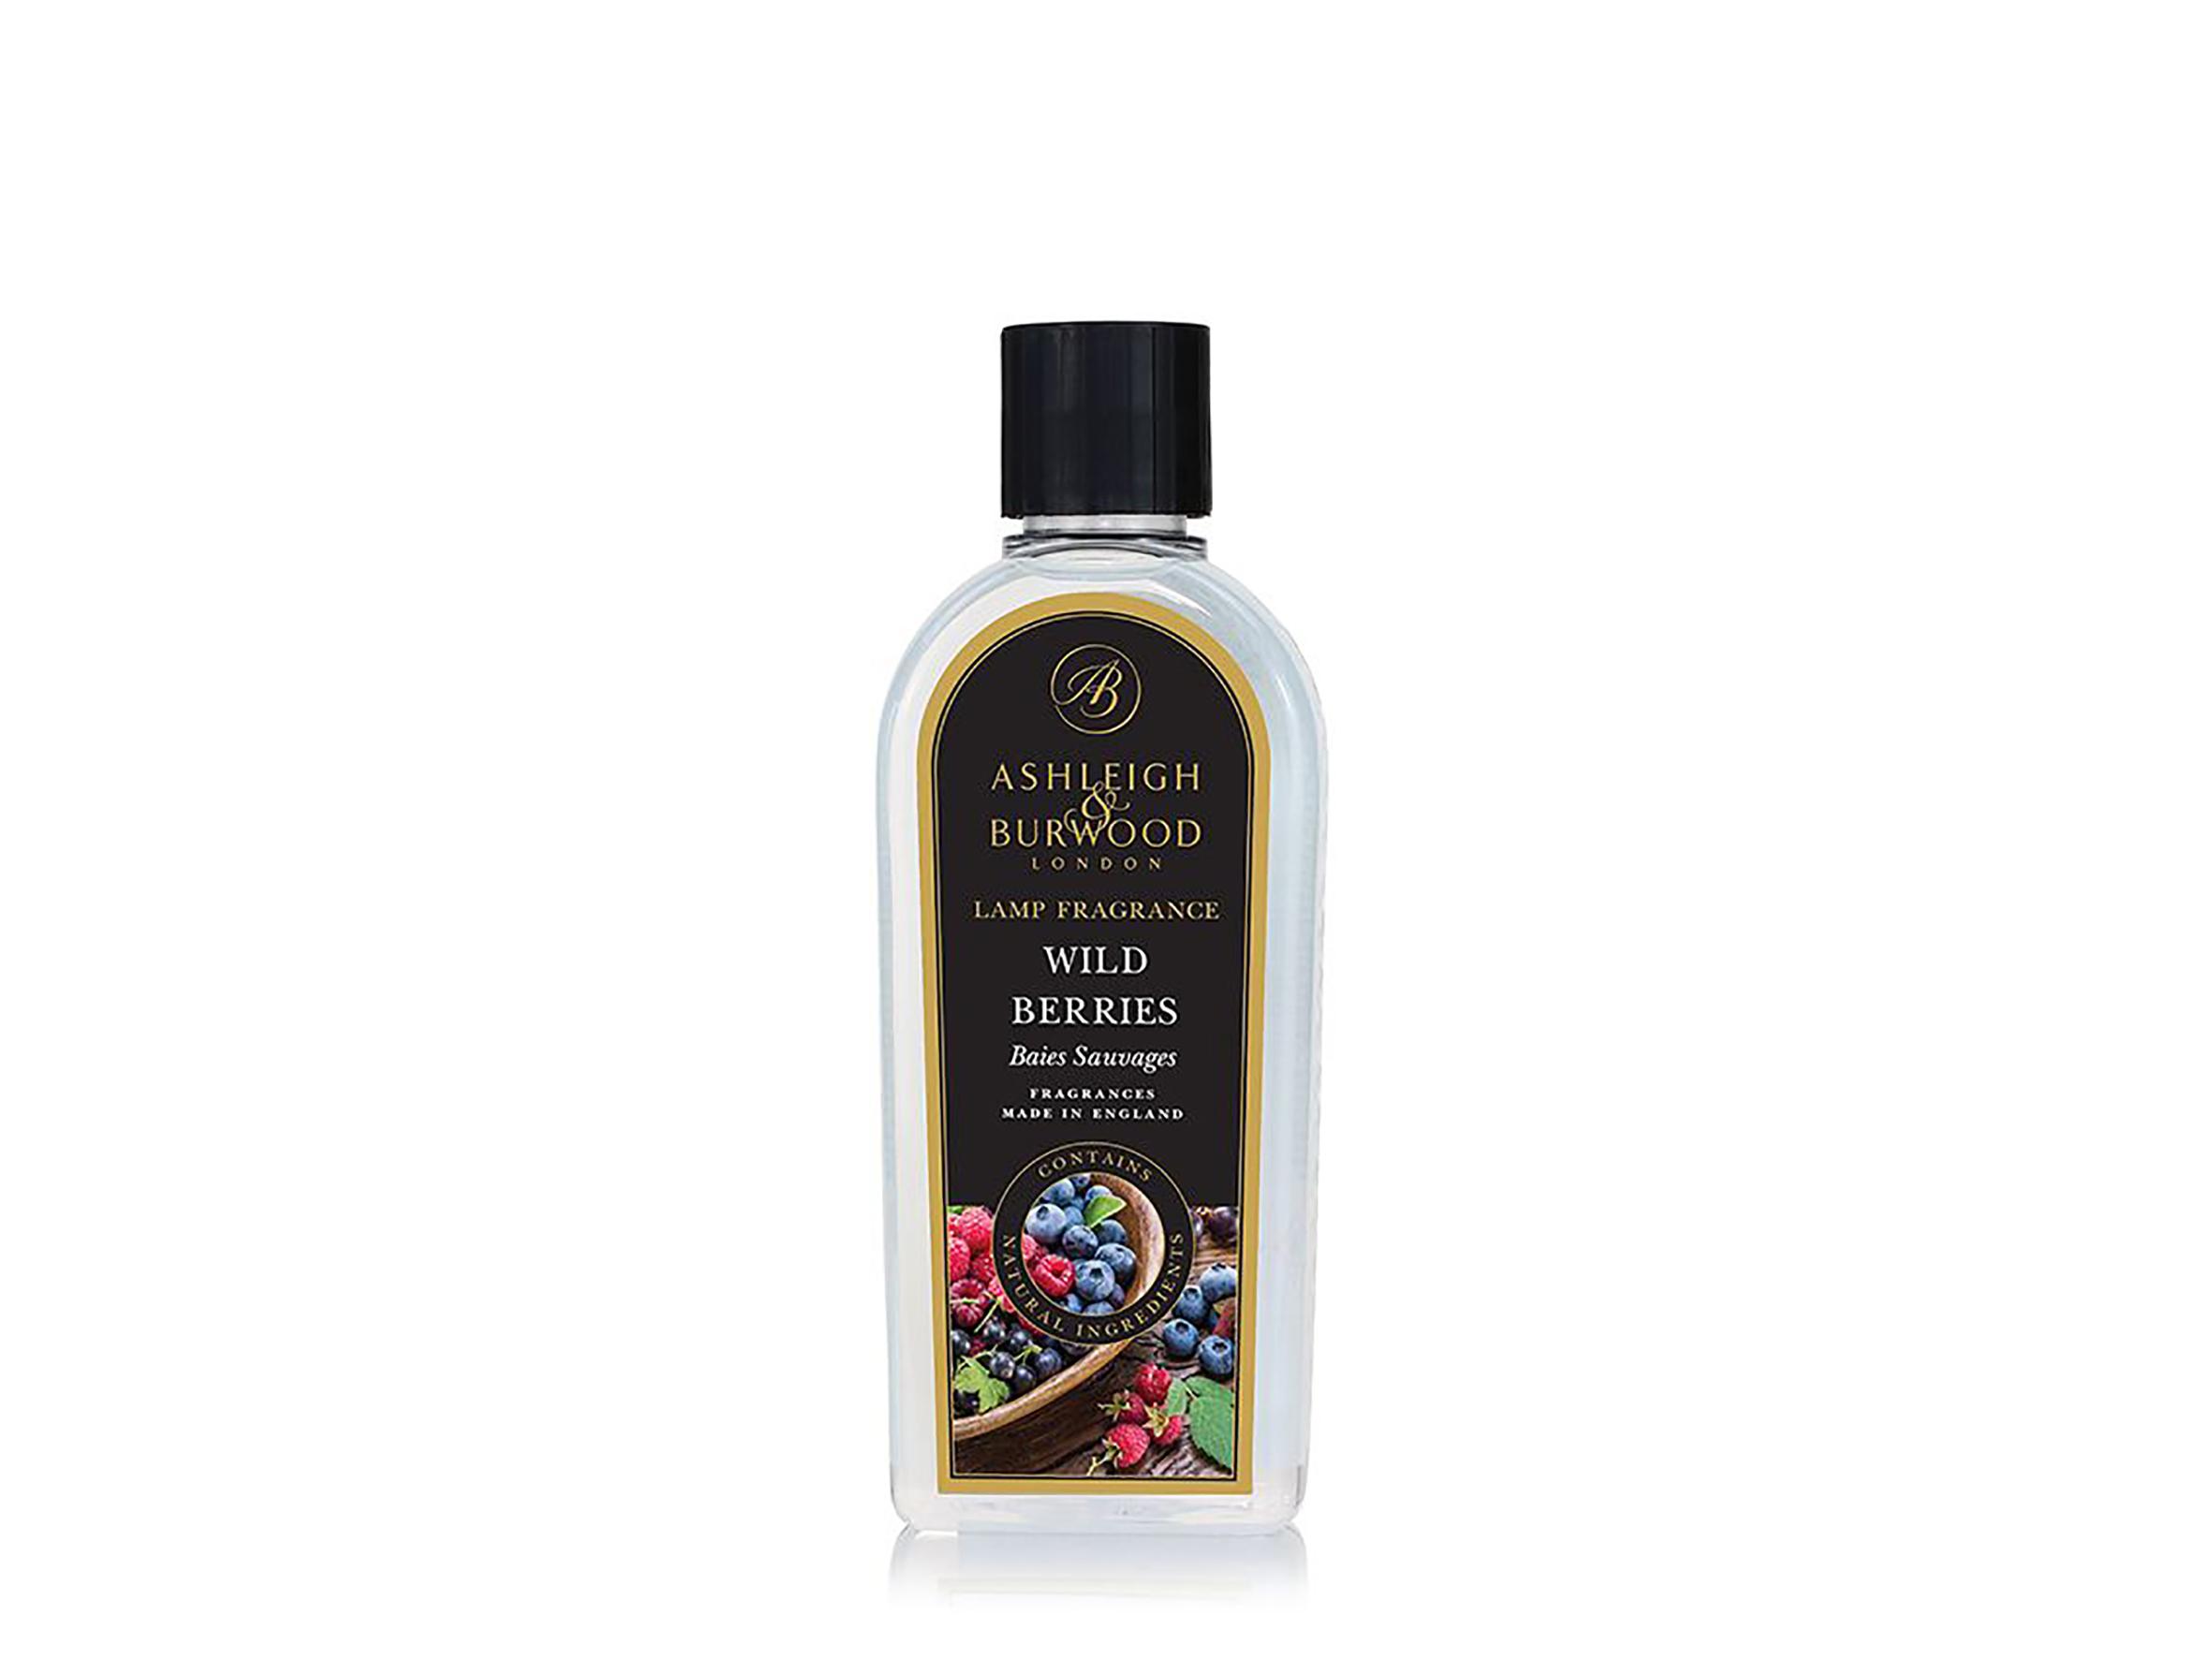 Geurlamp olie Wild Berries L